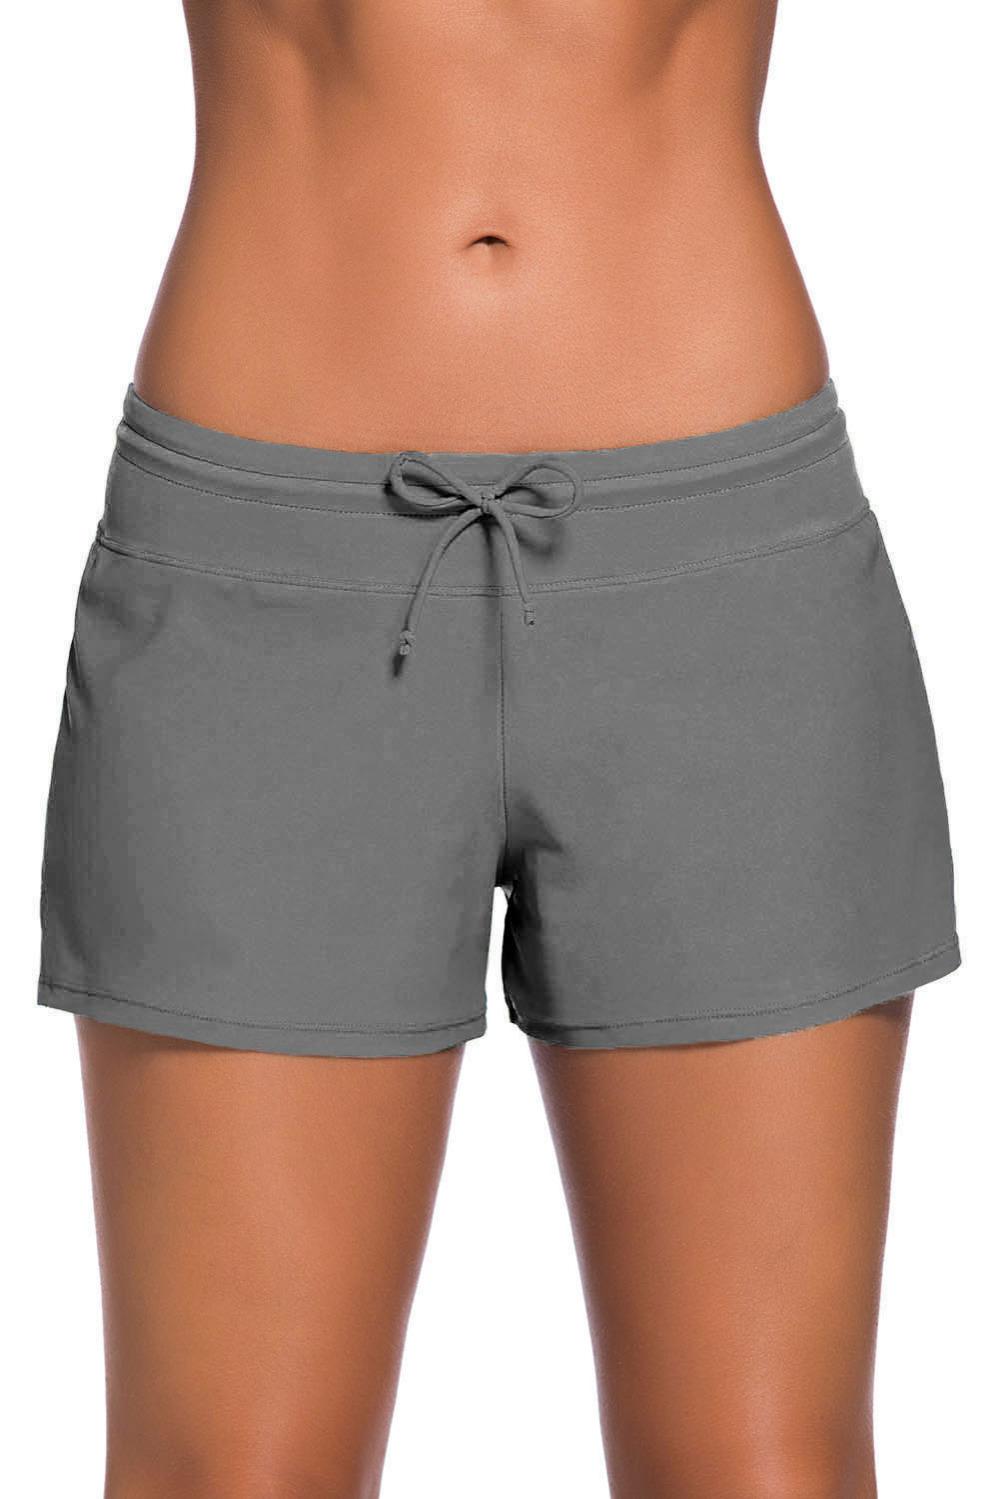 Grey-Women-Swim-Boardshort-LC41977-11-1